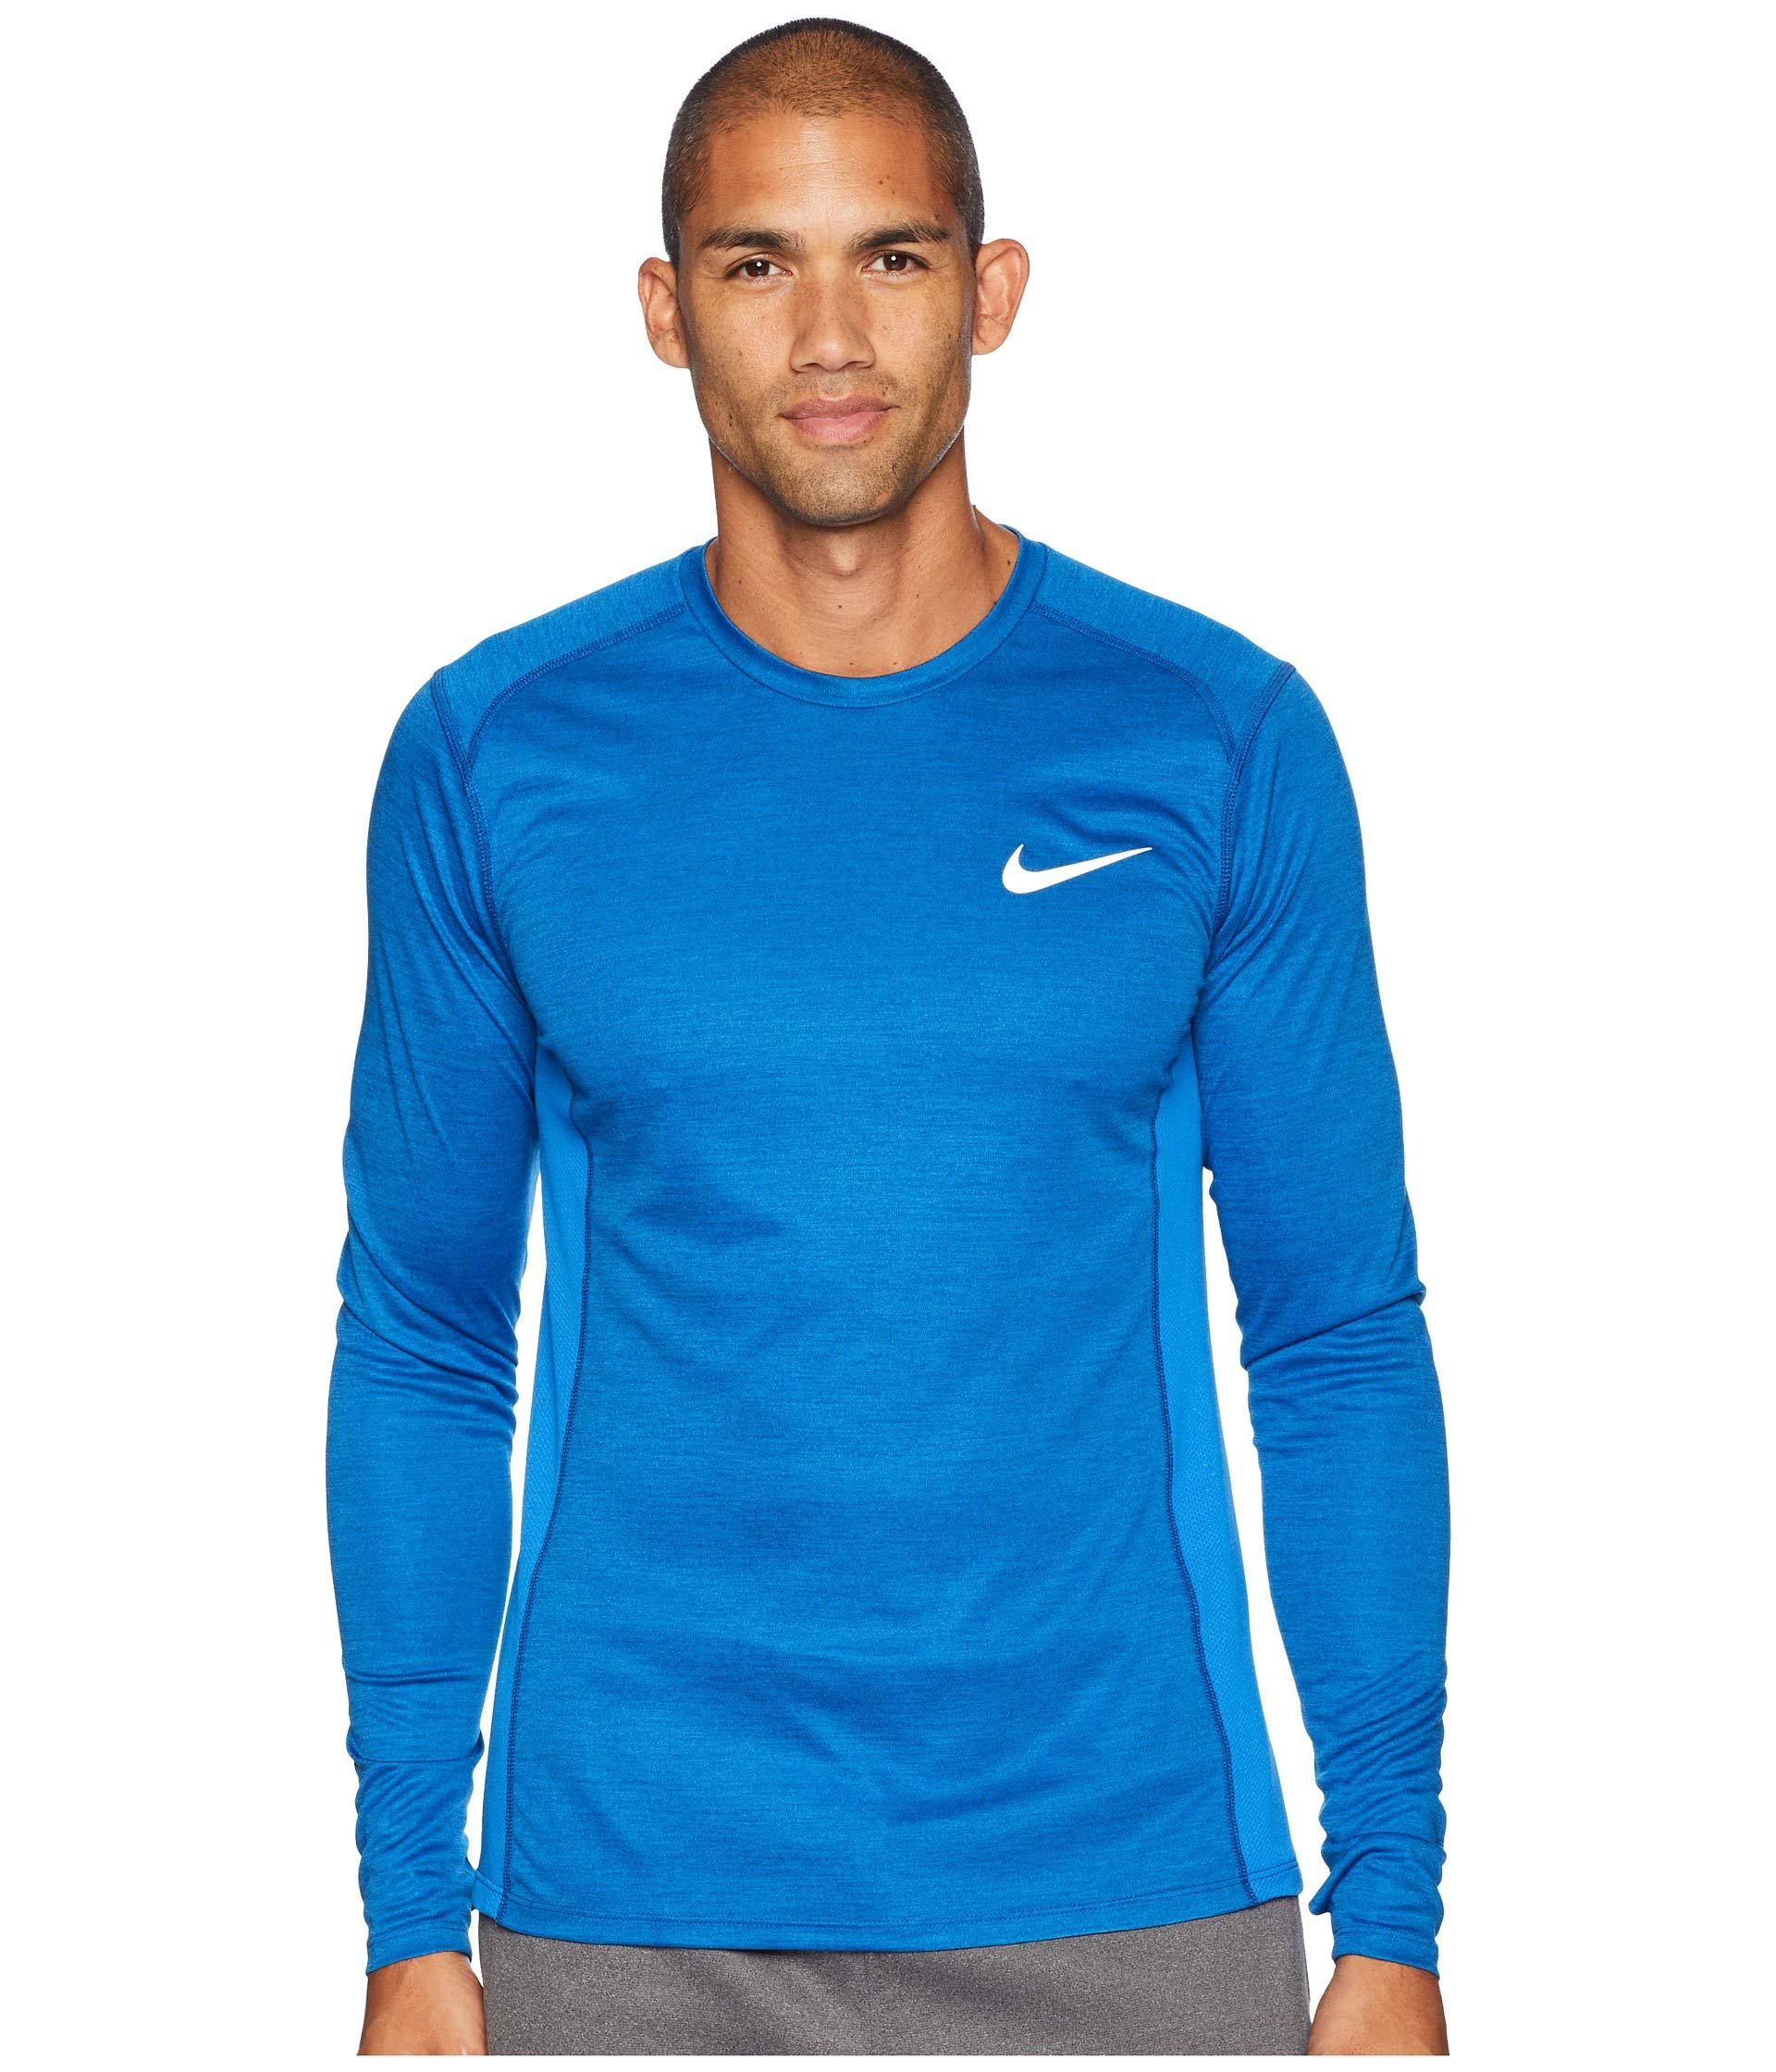 17c6c0599 Nike Miler Long Sleeve T Shirt Mens - DREAMWORKS